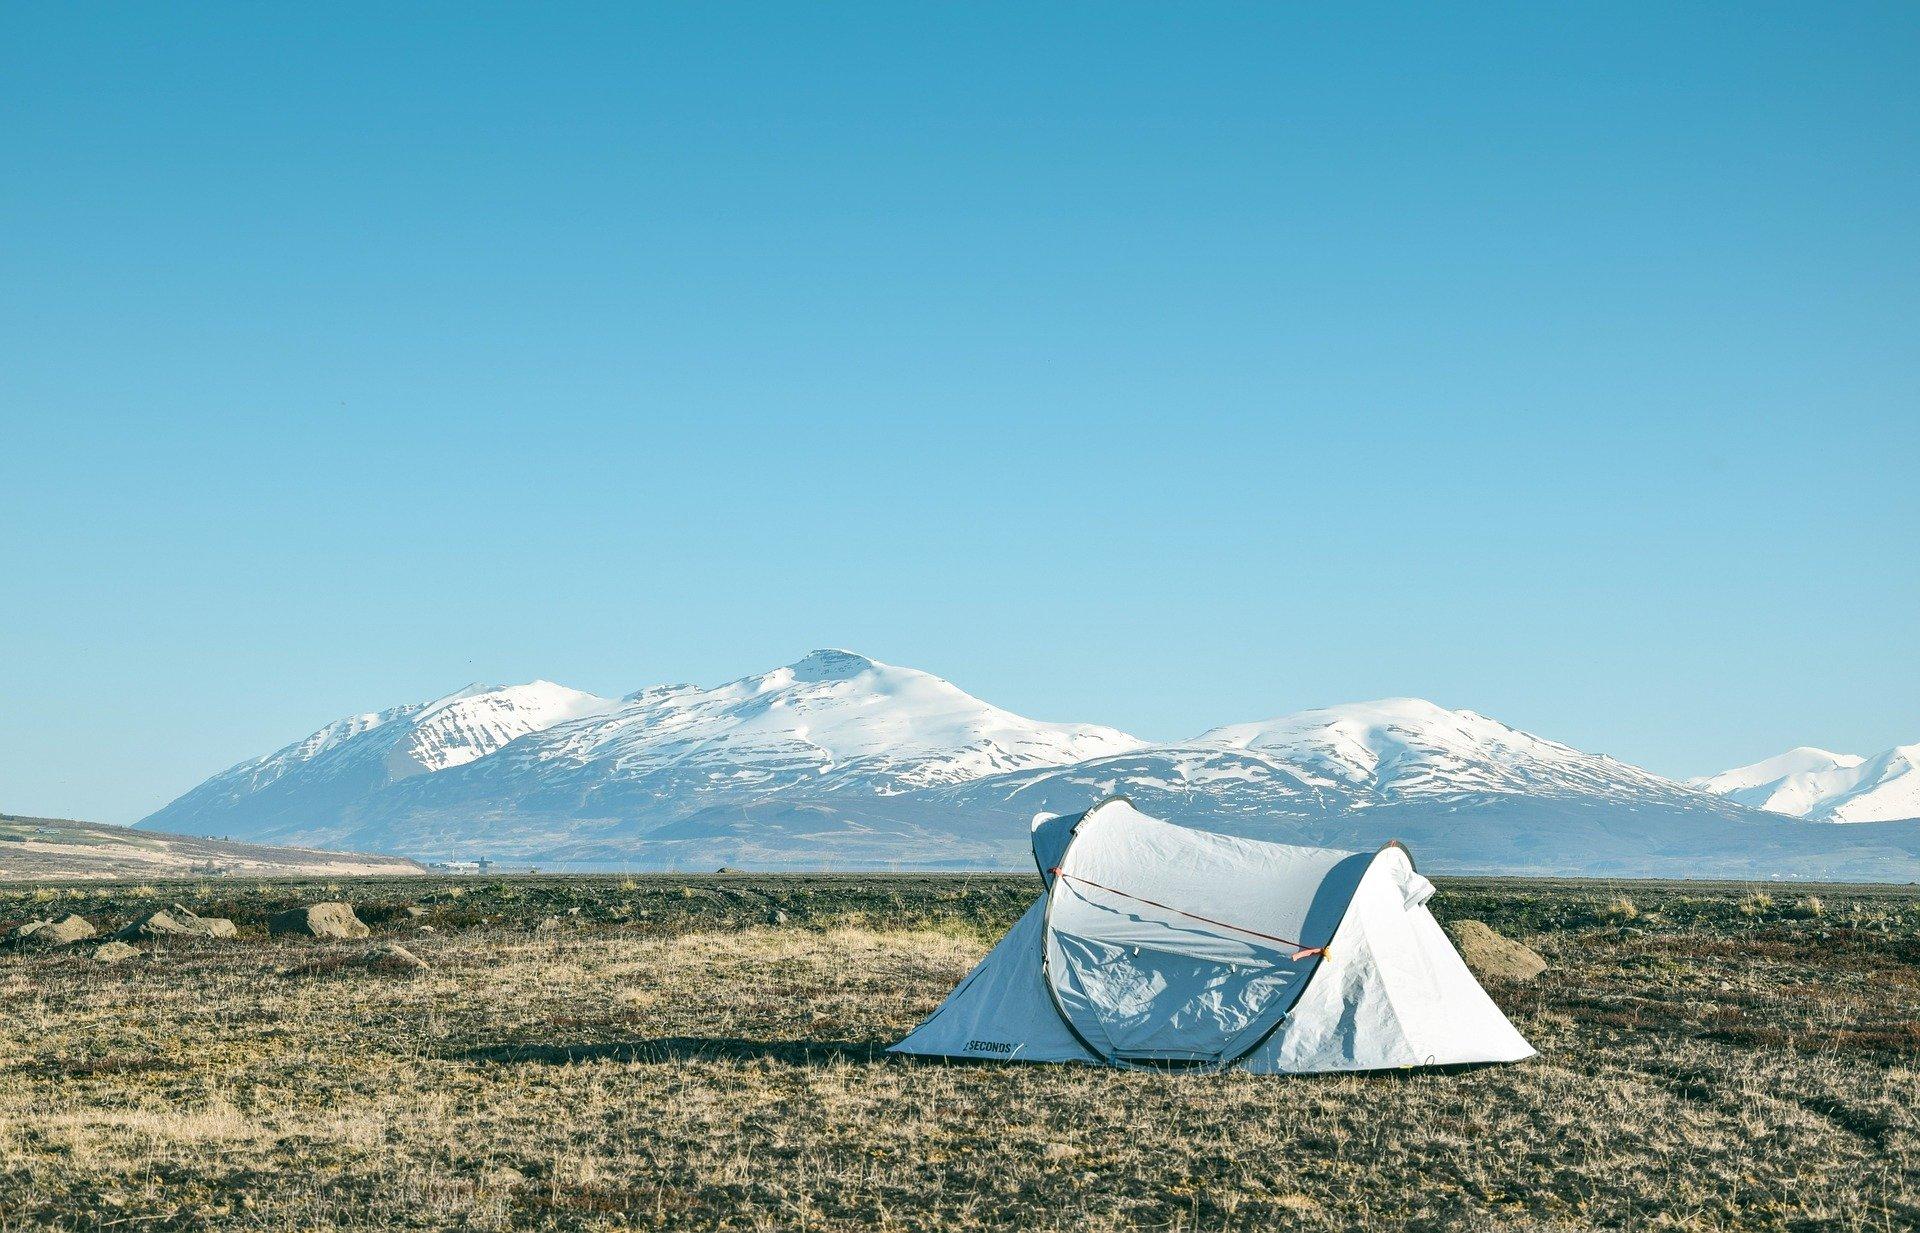 camp-2650359_1920